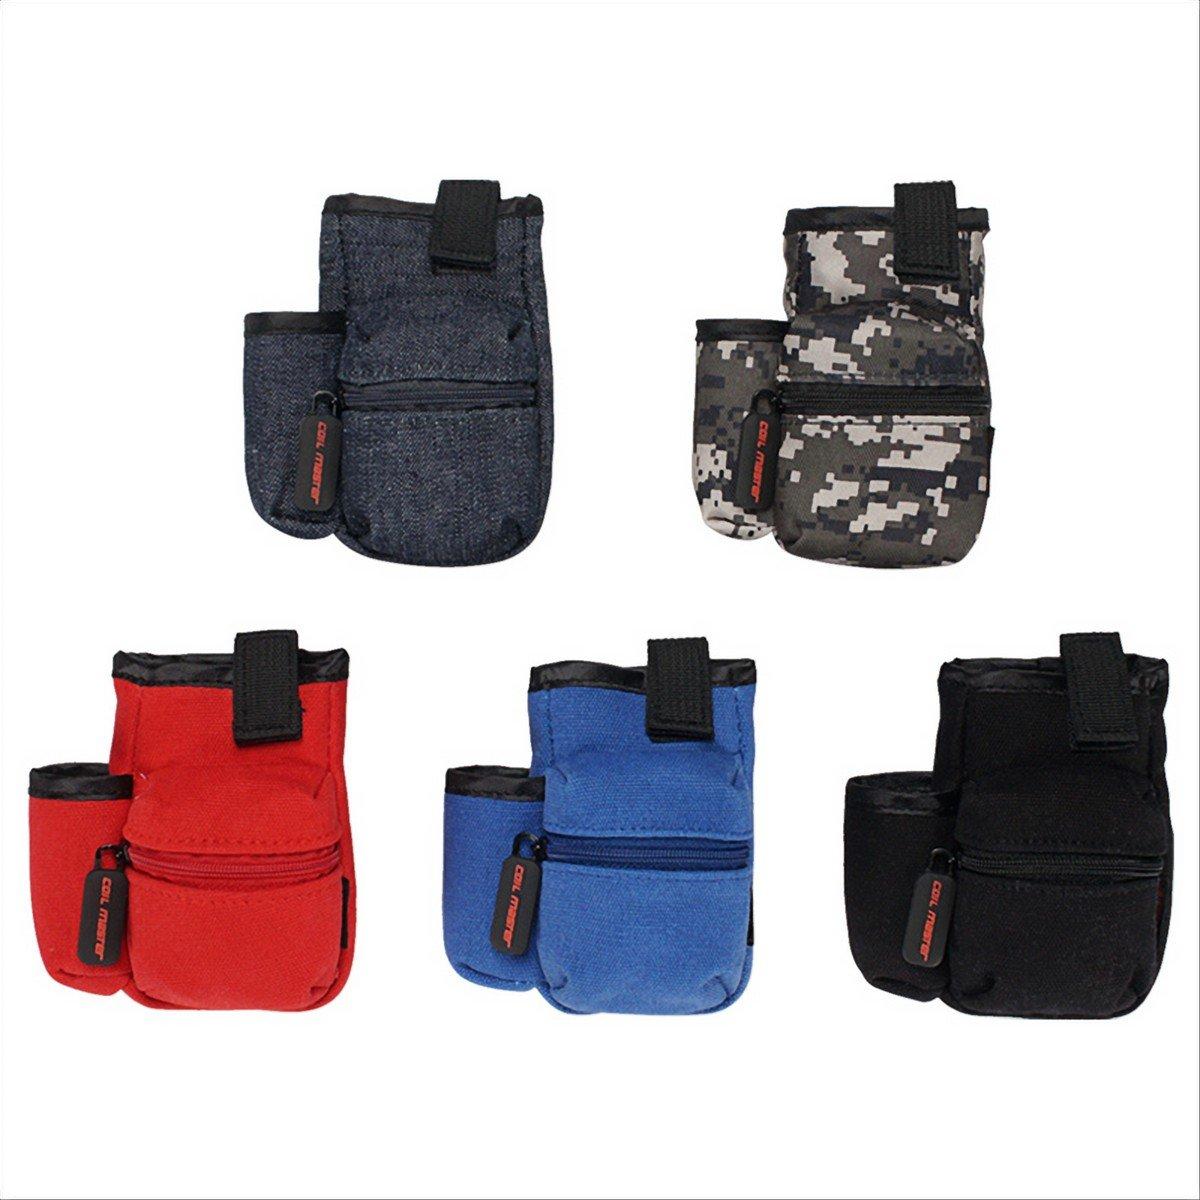 Coil Master Pbag 100% Auténtico Universal Cigarrillo electrónico Vape Travel Estuche portátil de viaje Mini Vape Bolsa para herramientas, líquidos [SOLO ...